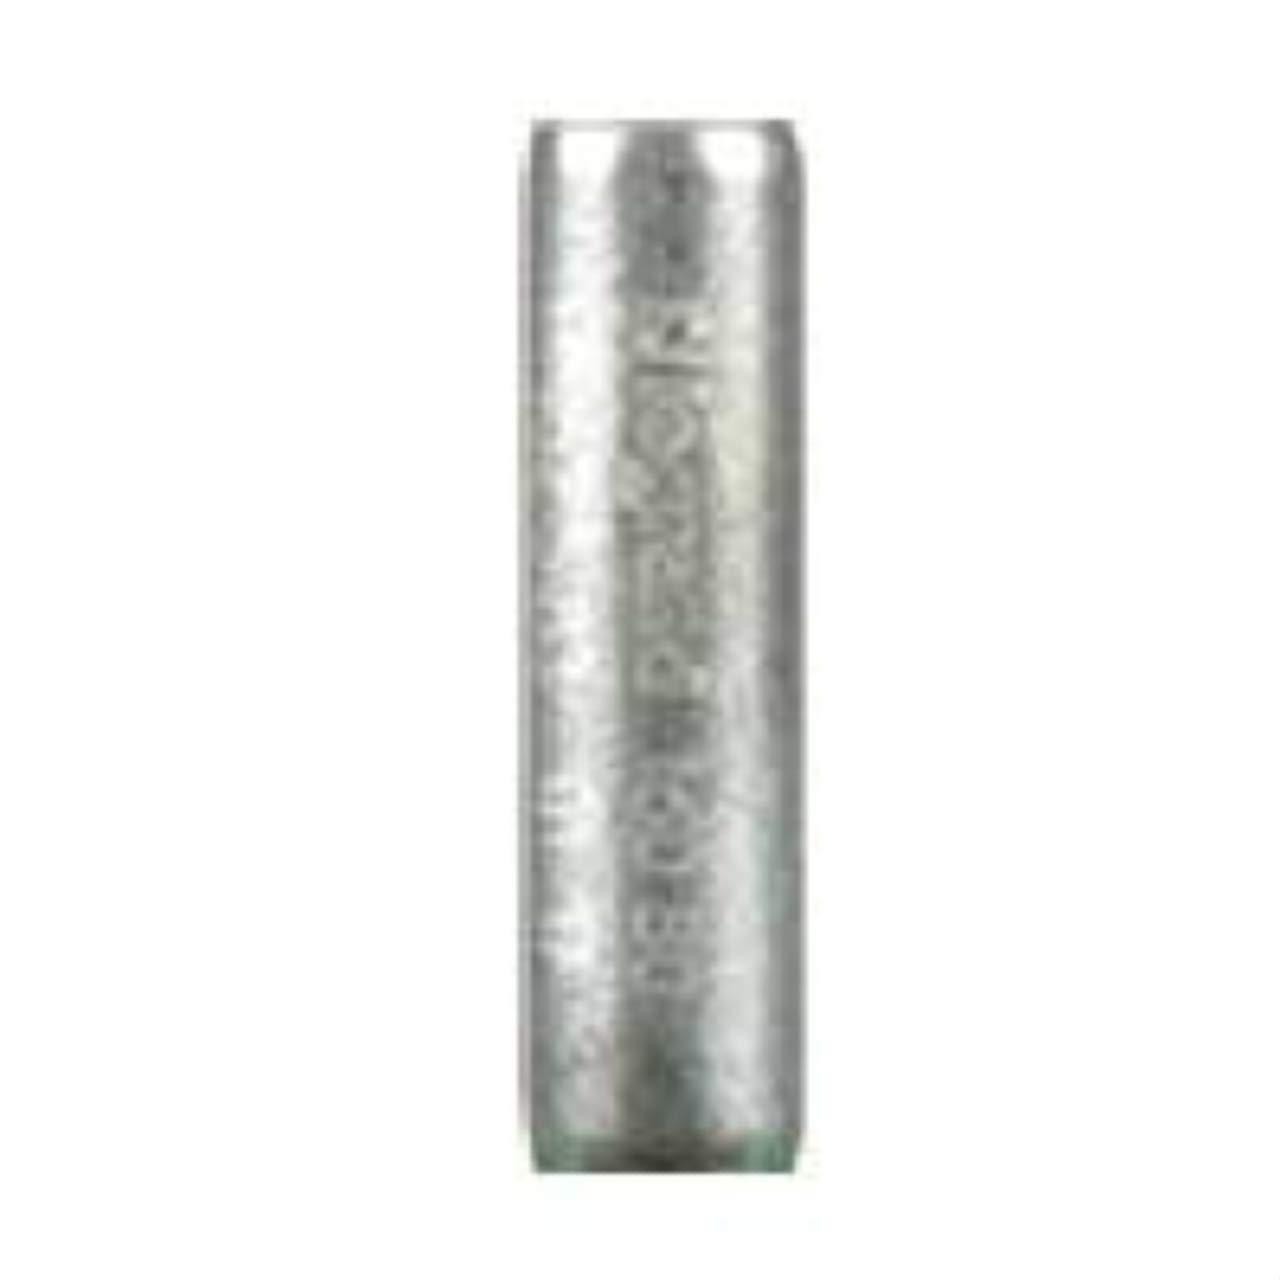 22x58 mm Cartouche EDF cylindrique AD neutre